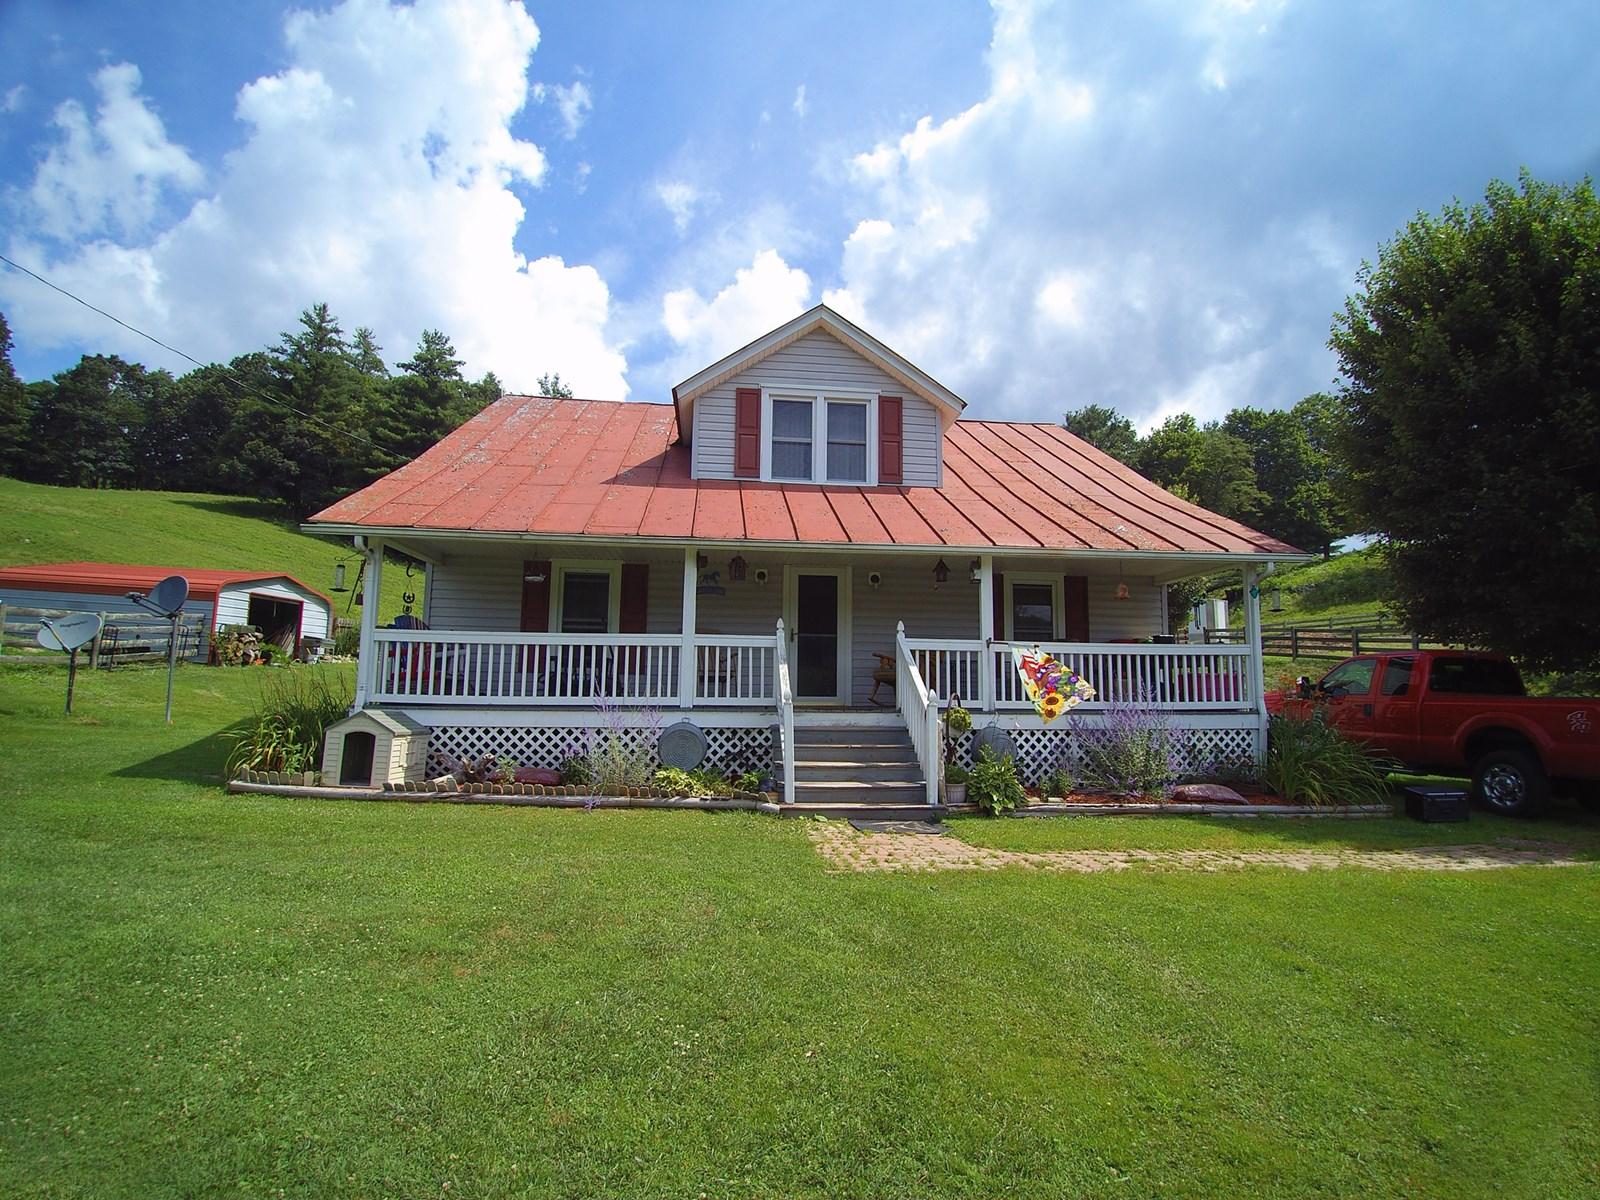 Grayson Highlands Mini-Farm